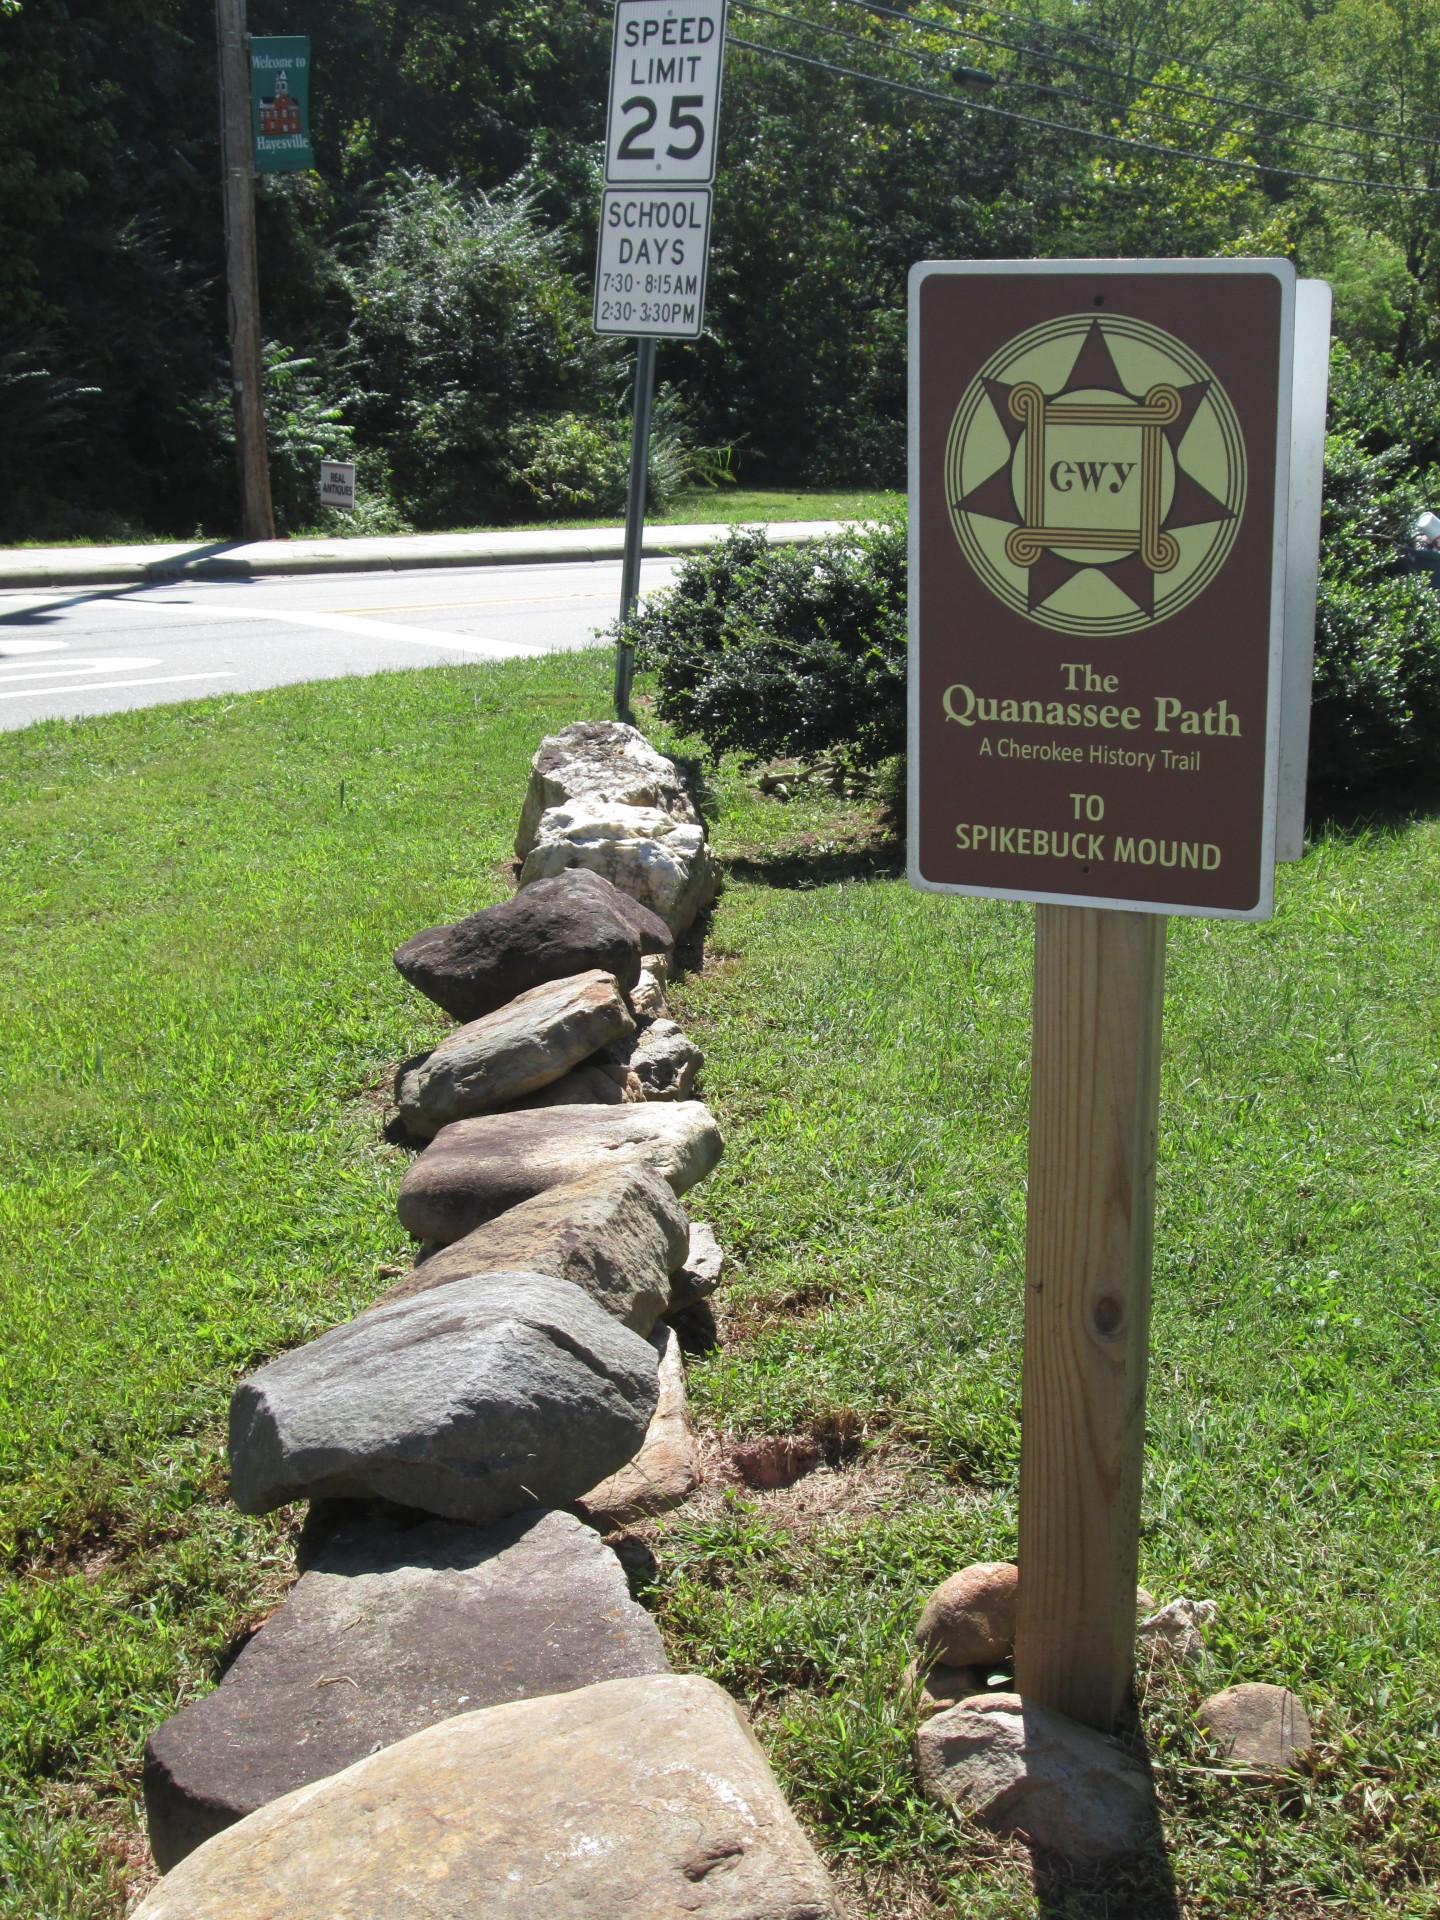 The Quanassee Path